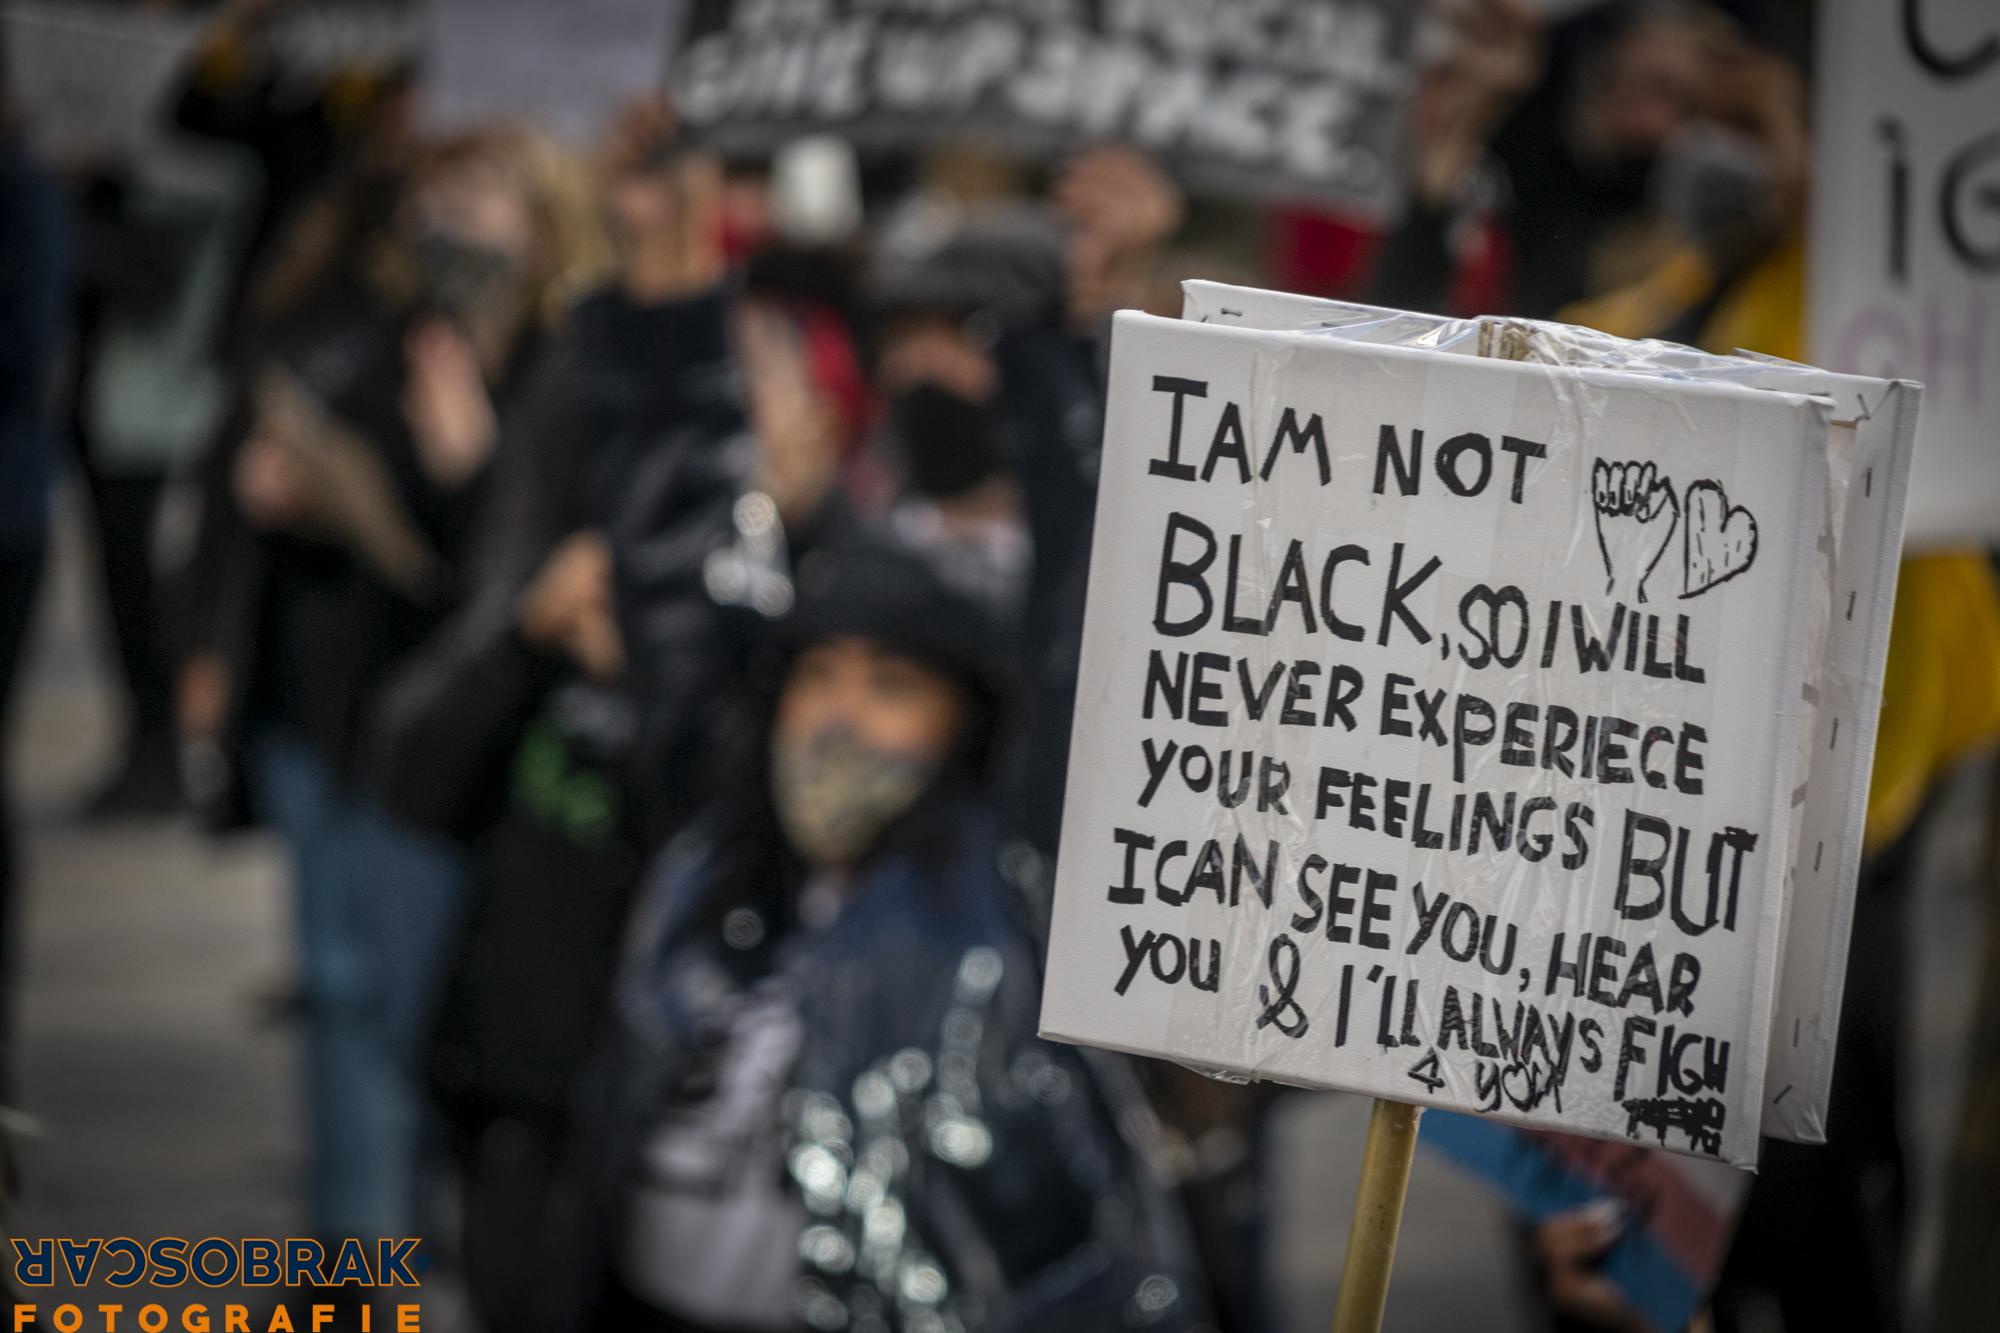 george floyd, black live matters, utrecht, demo, oscar brak fotografie